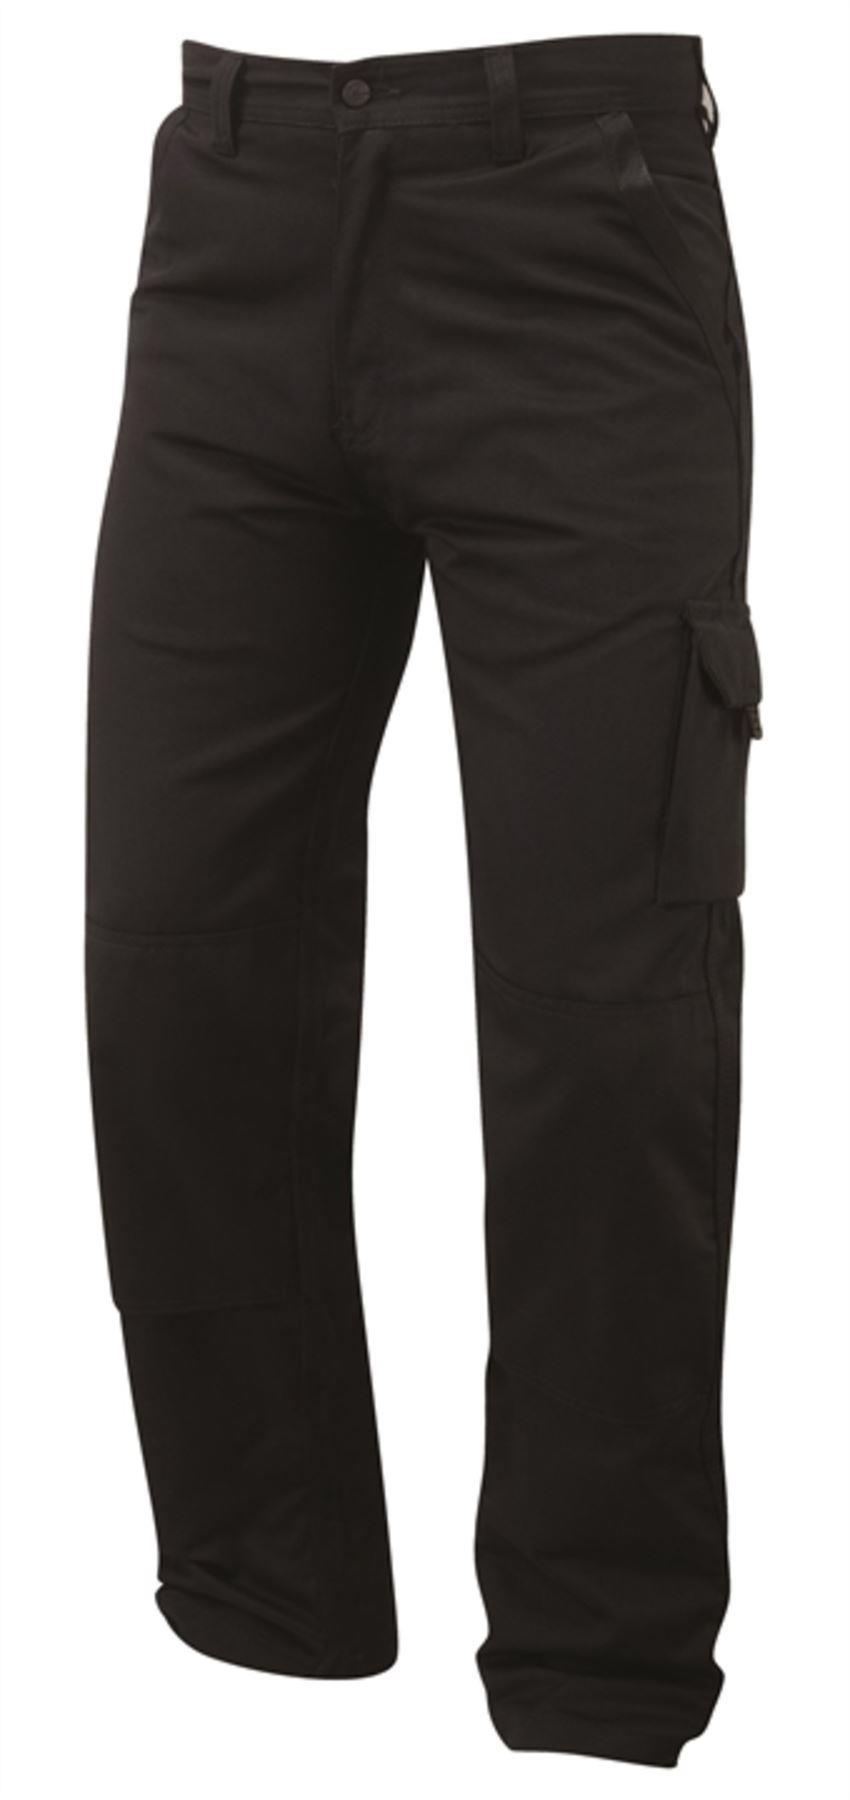 Orn Heron Kneepad Combat Trousers - Black|42W29L